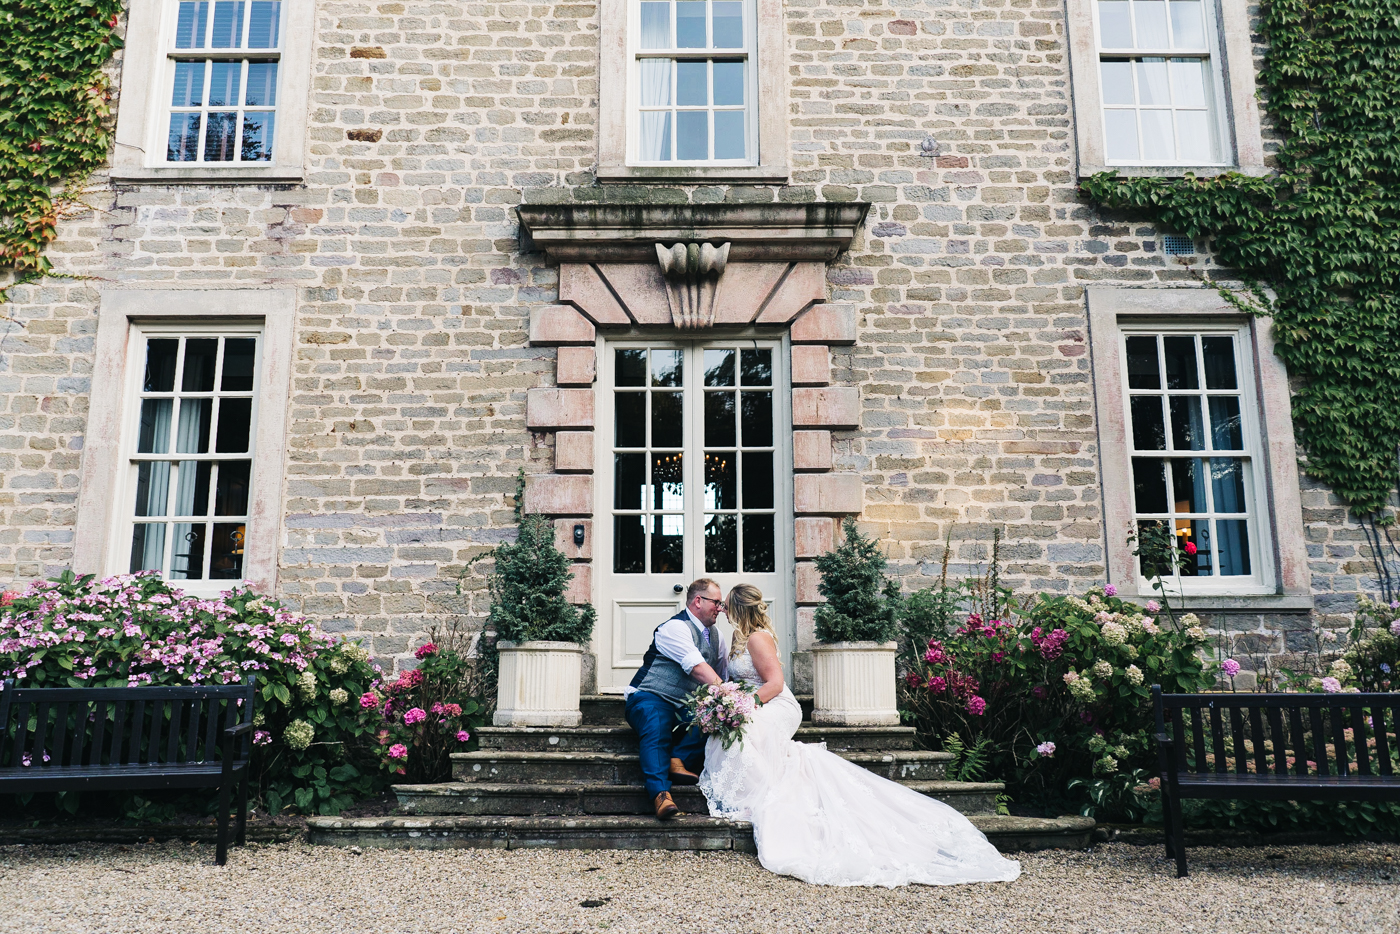 headlame-hall-north-yorkshire-north-east-photographer-wedding-0048.jpg